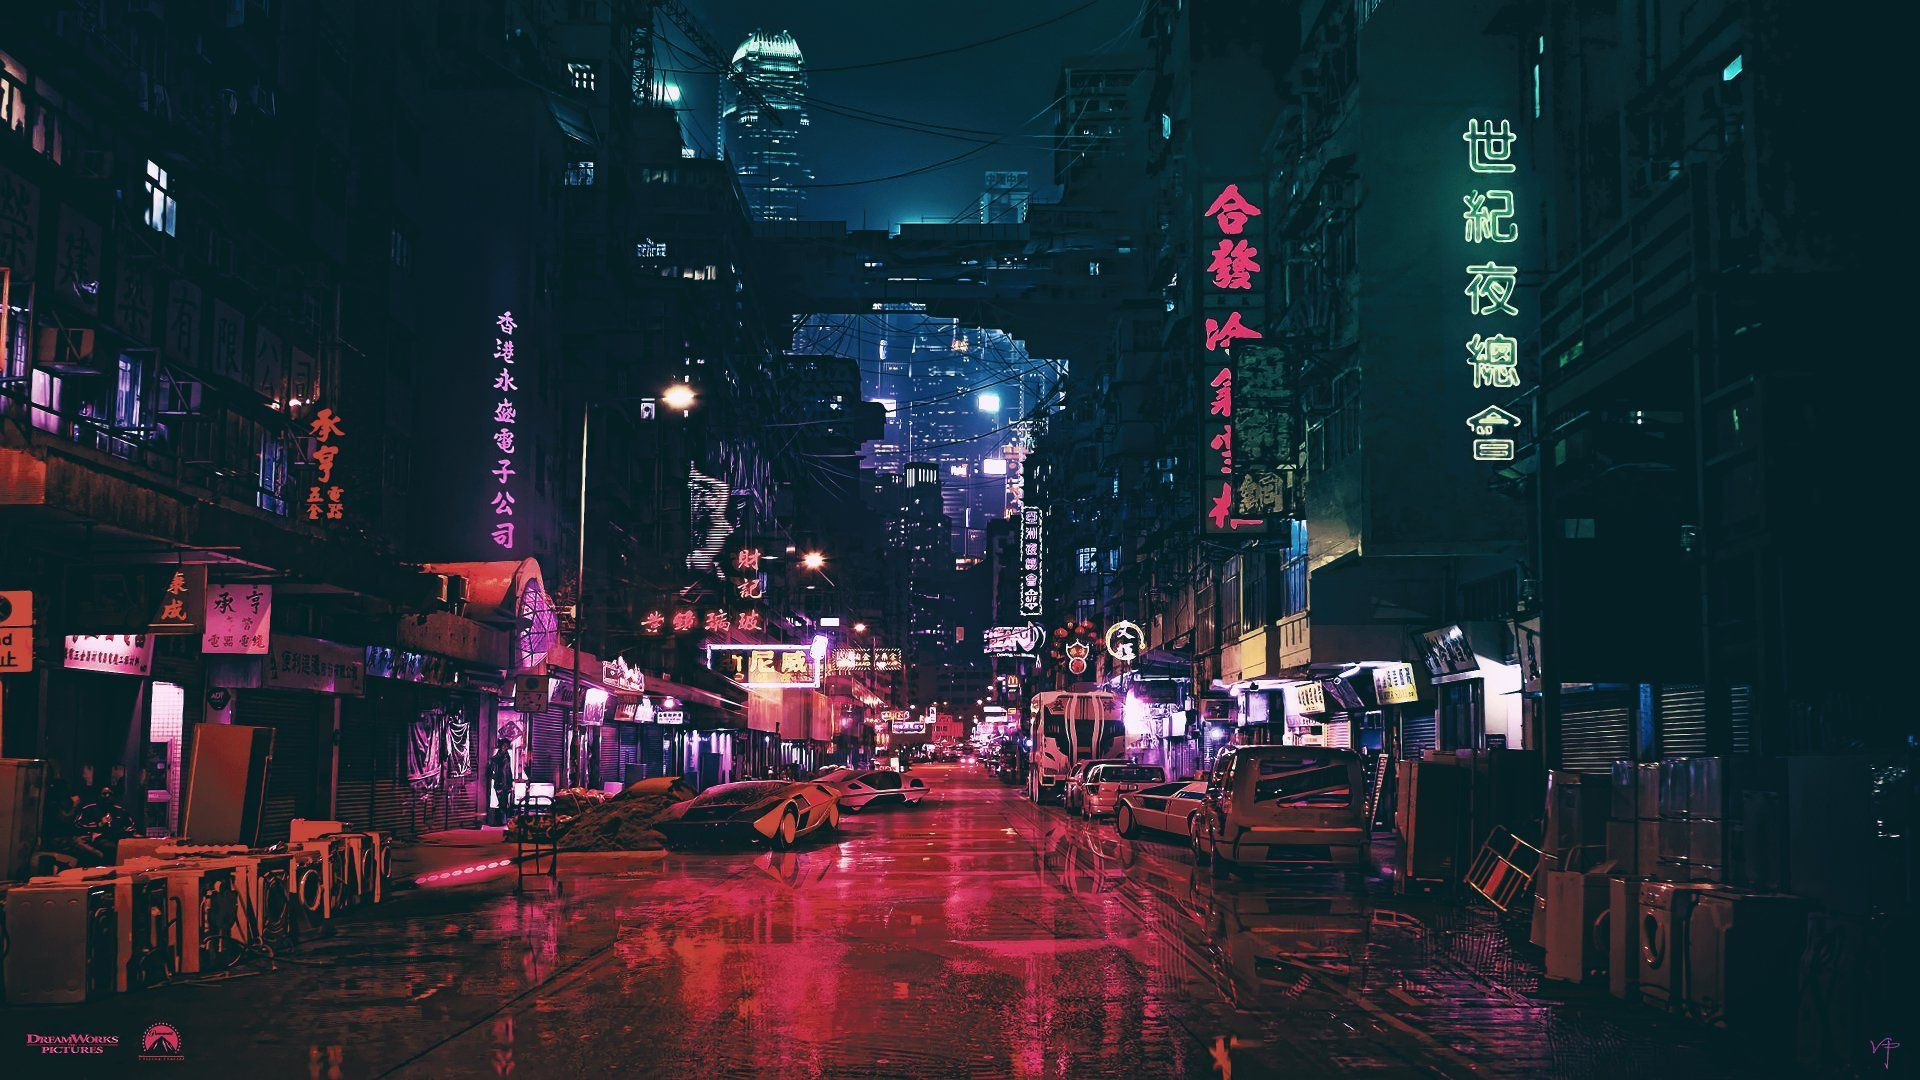 55 Cyberpunk Wallpapers Download At Wallpaperbro City Wallpaper Futuristic City Cyberpunk City